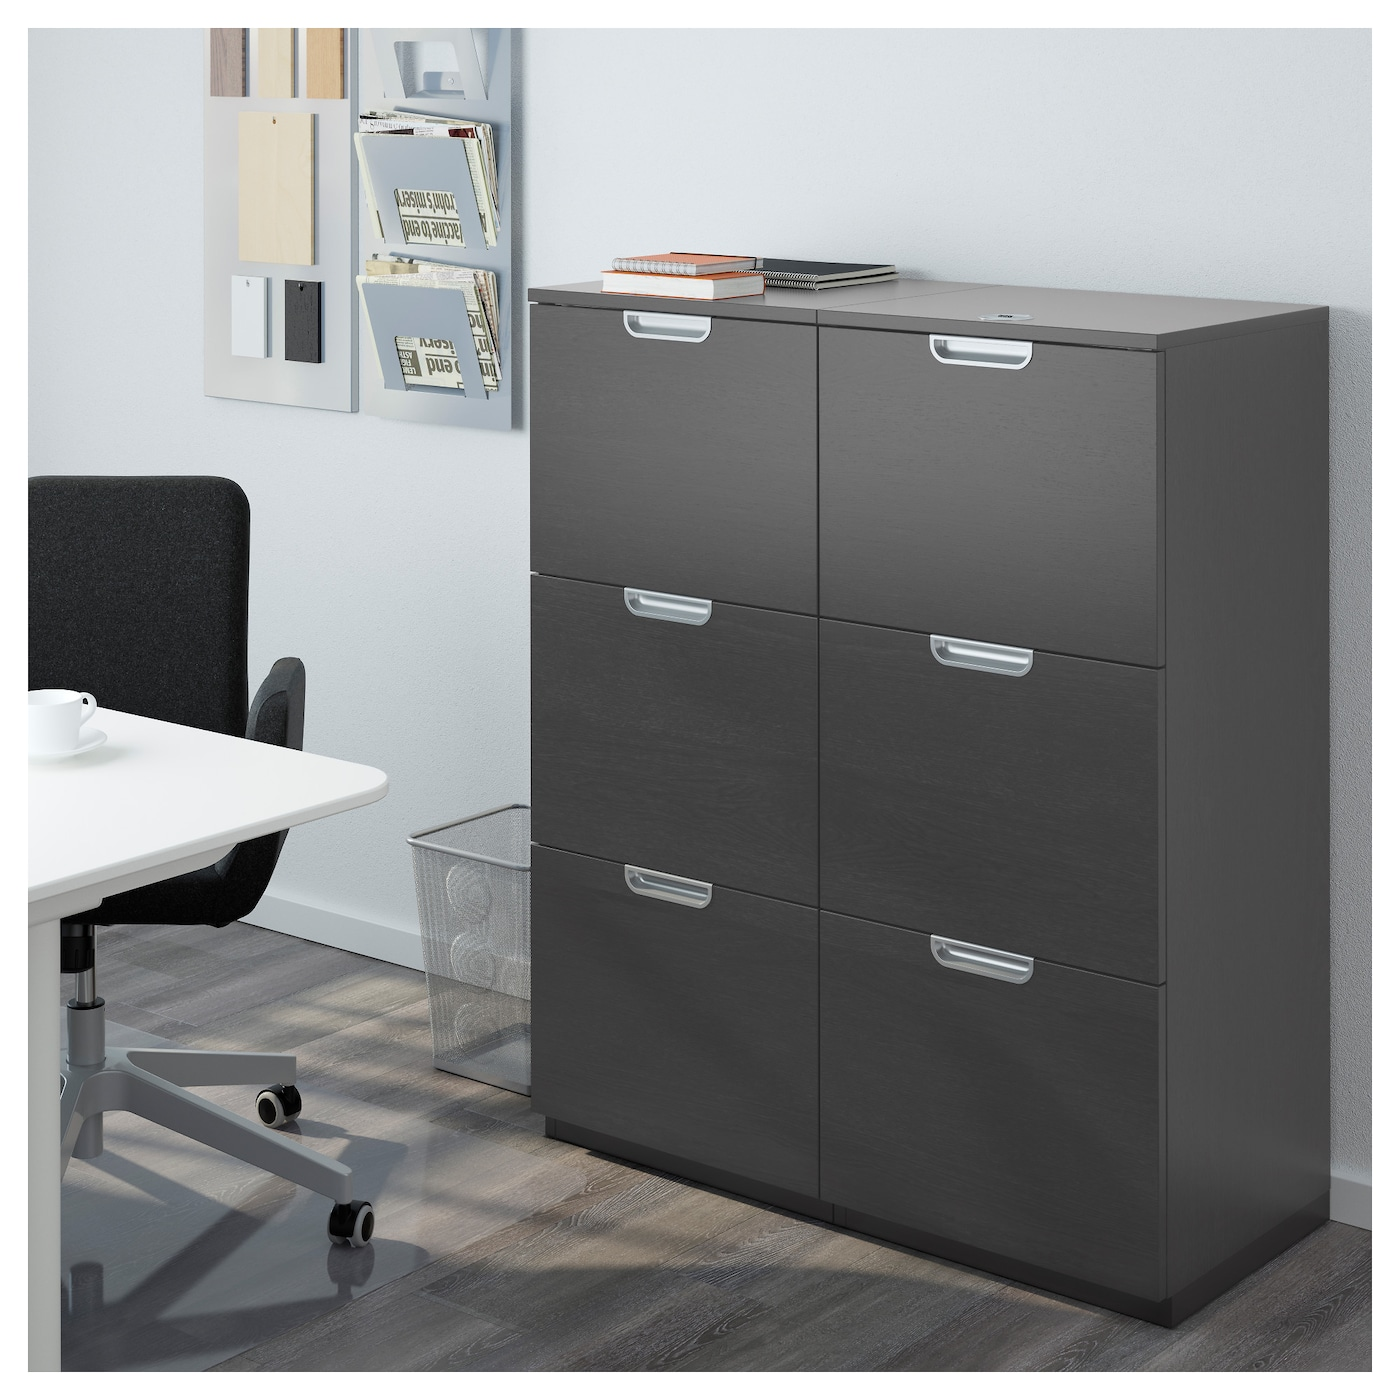 galant storage combination with filing black brown 102 x 120 cm ikea. Black Bedroom Furniture Sets. Home Design Ideas